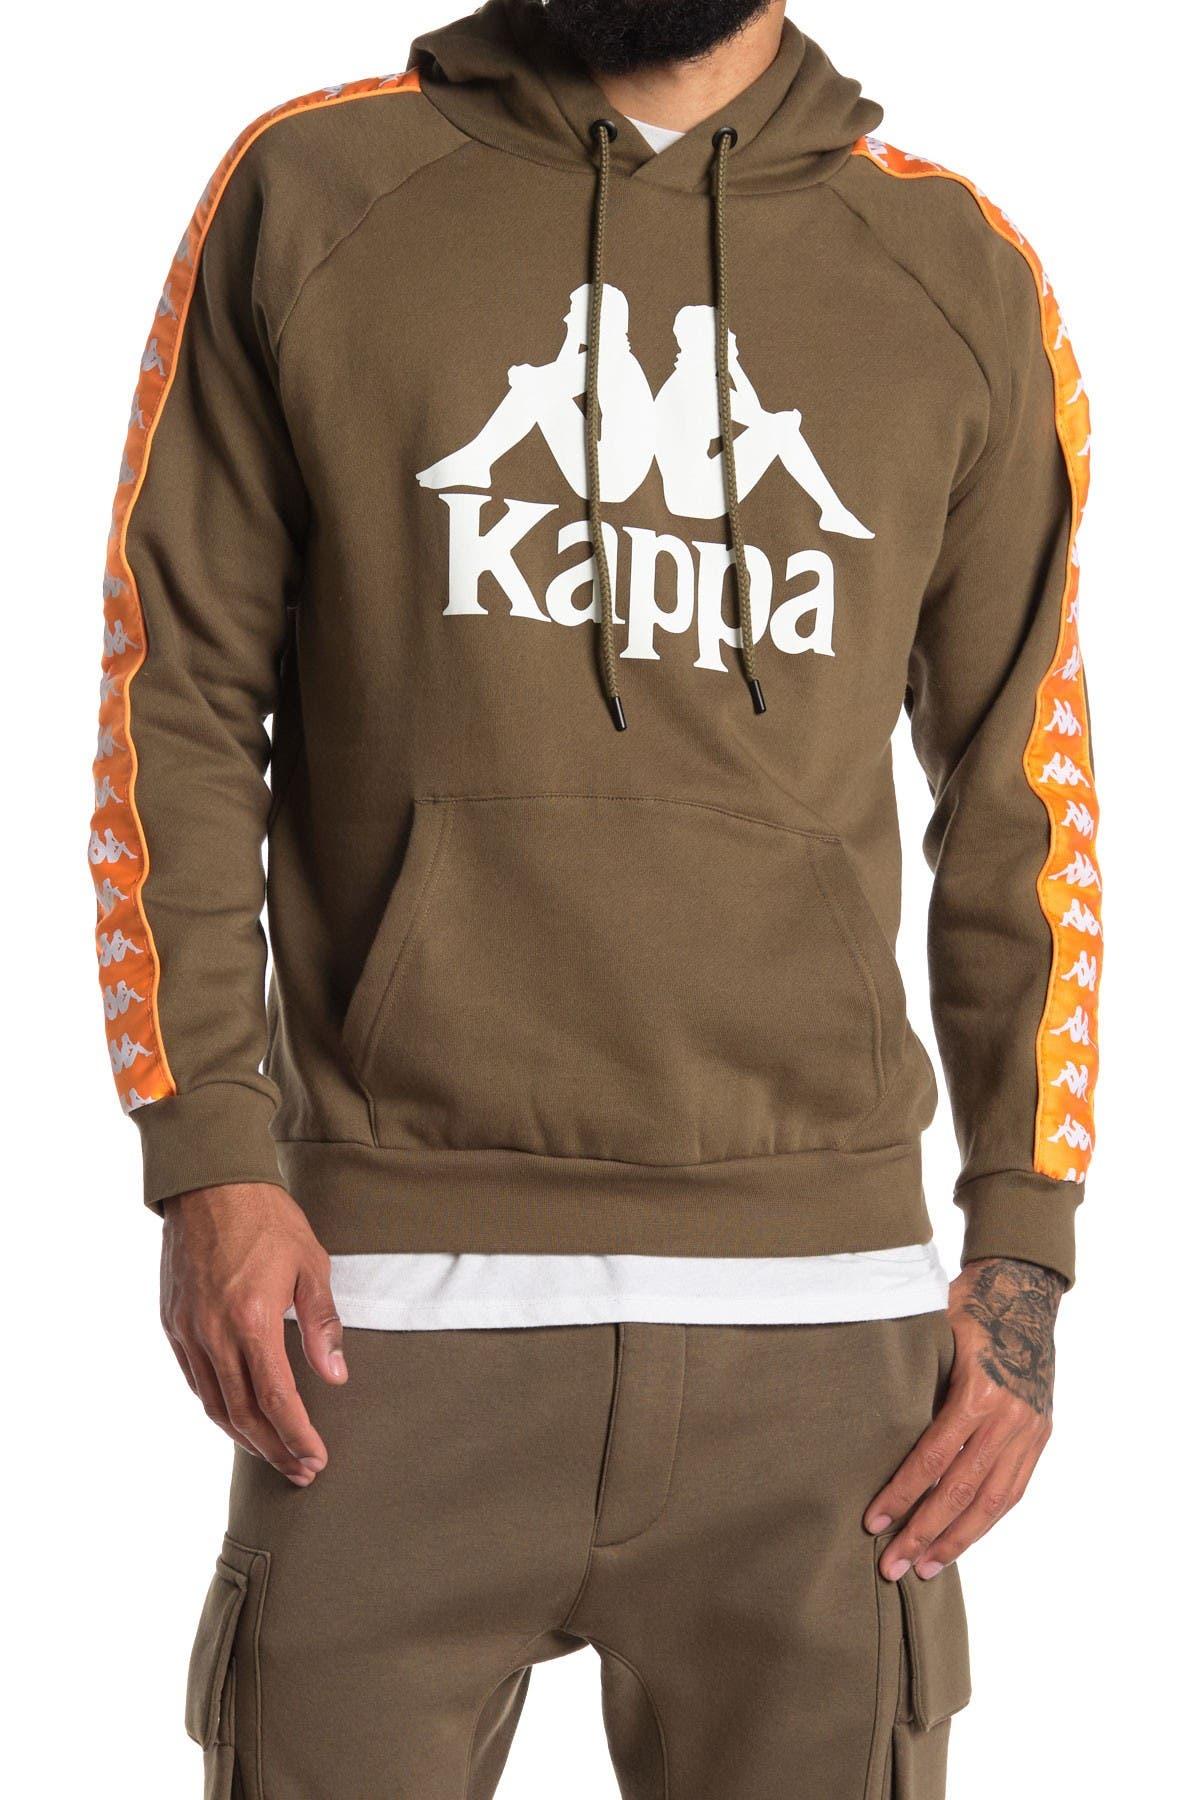 Image of Kappa Active 222 Banda Hurtado 2 Hoodie